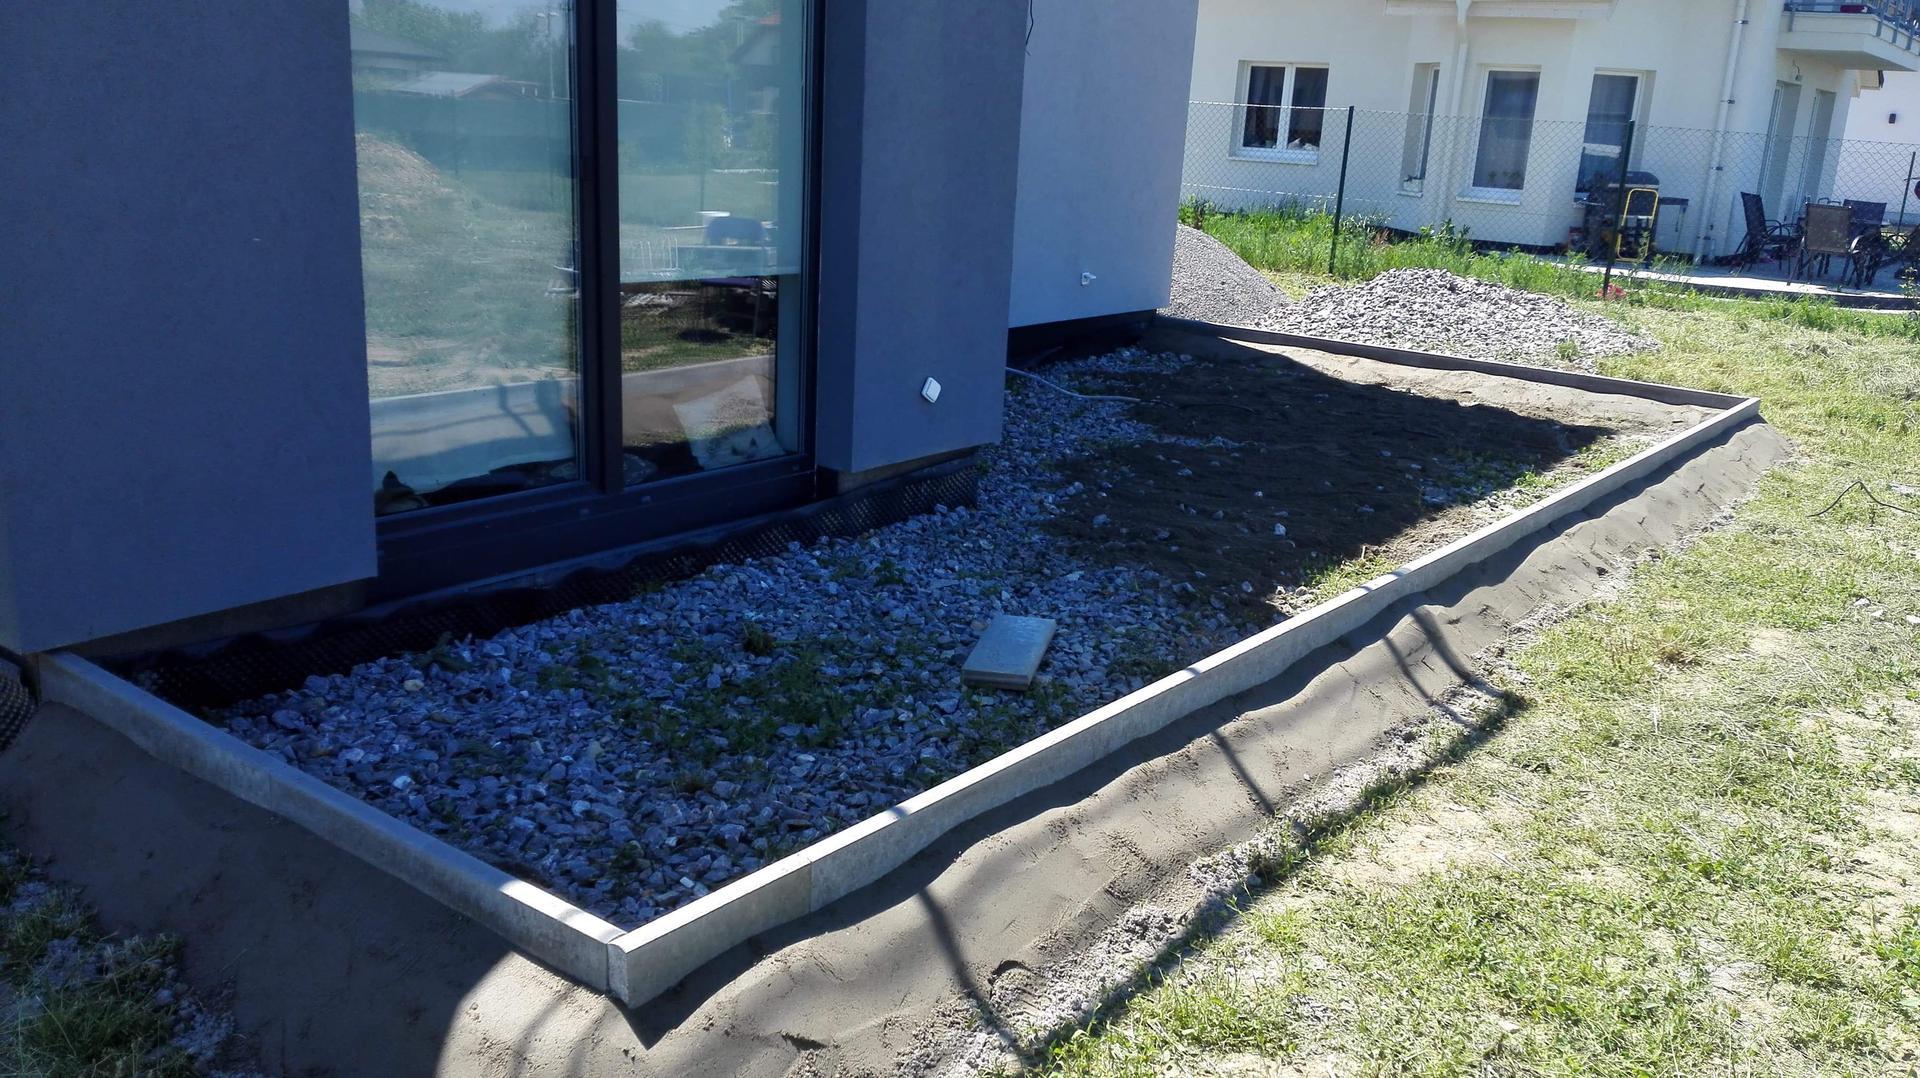 Zahrada na klíč - Základy terasy se již rýsují.